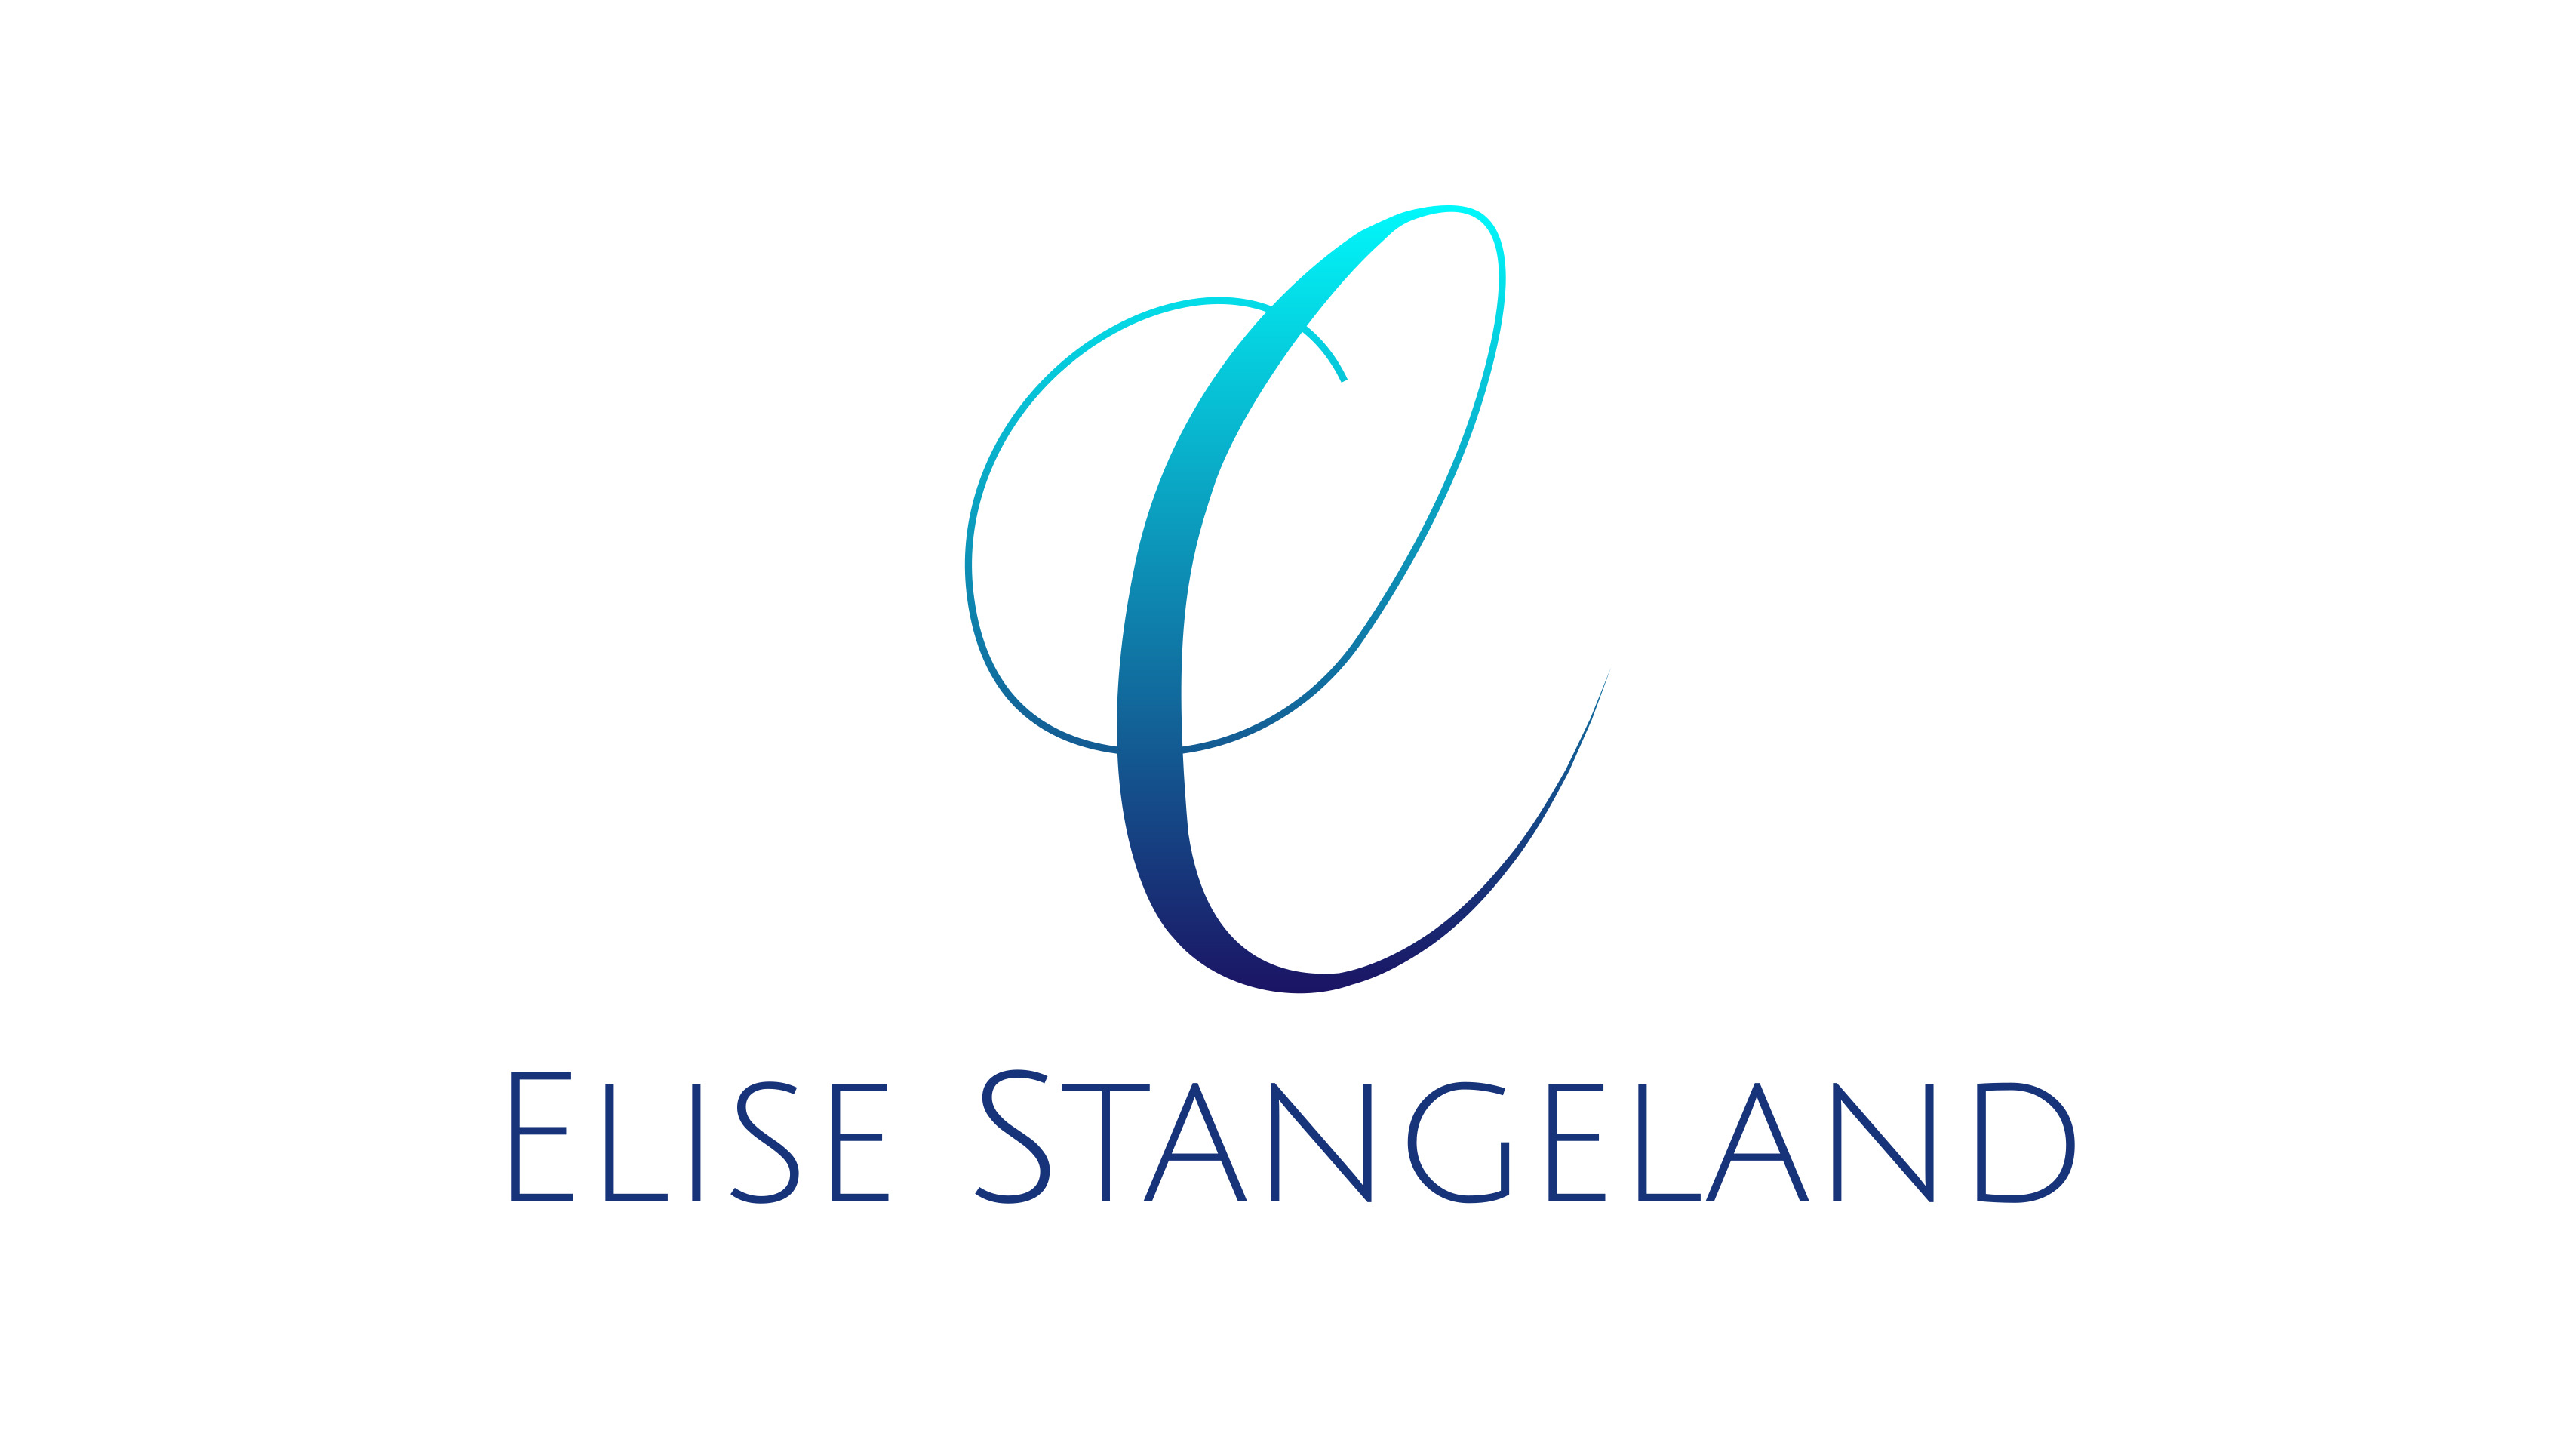 Elise Stangeland